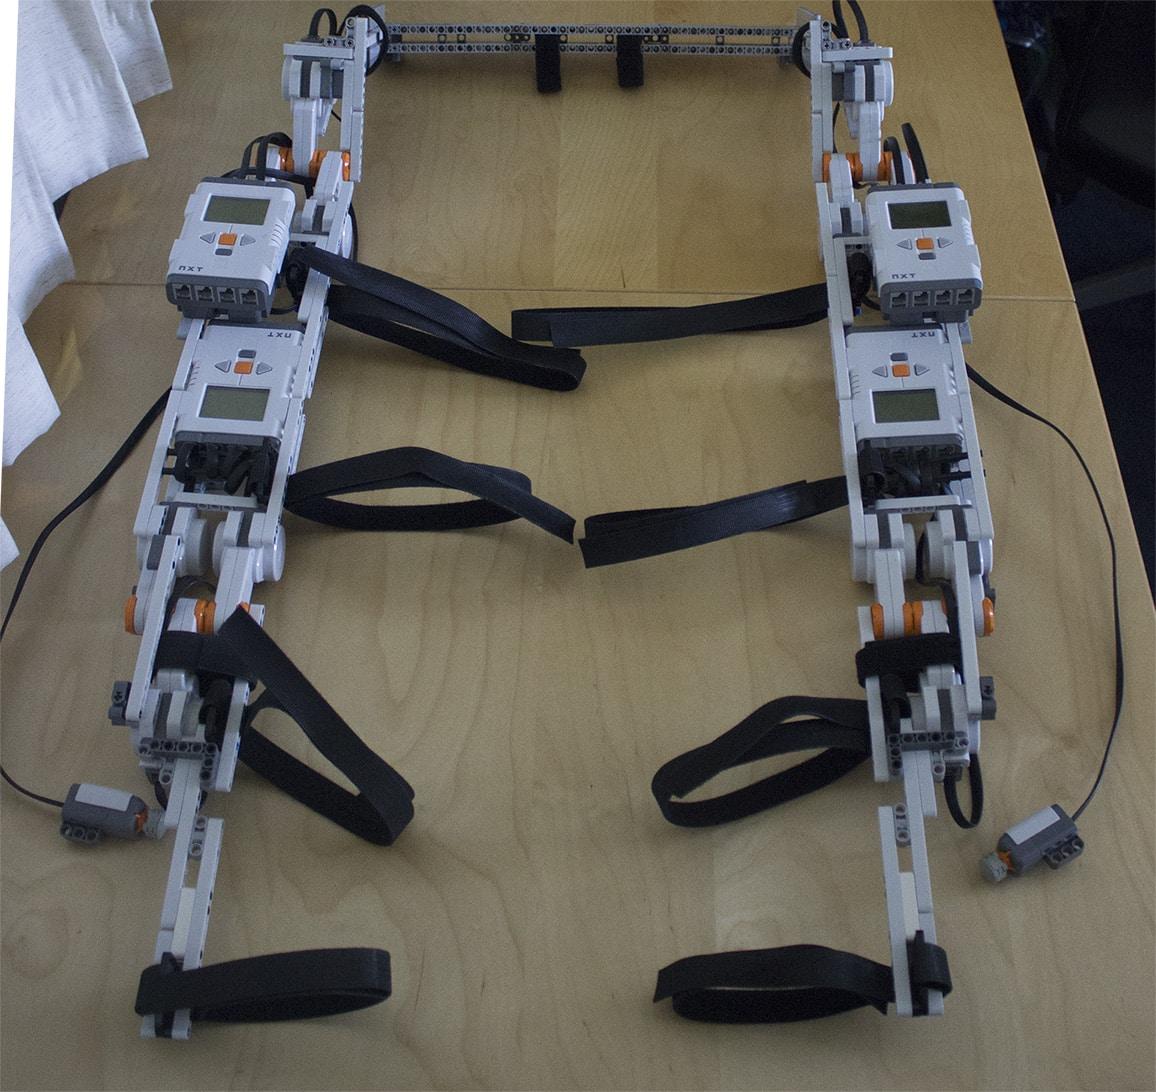 LEGO Powered Hip-Knee Exoskeleton